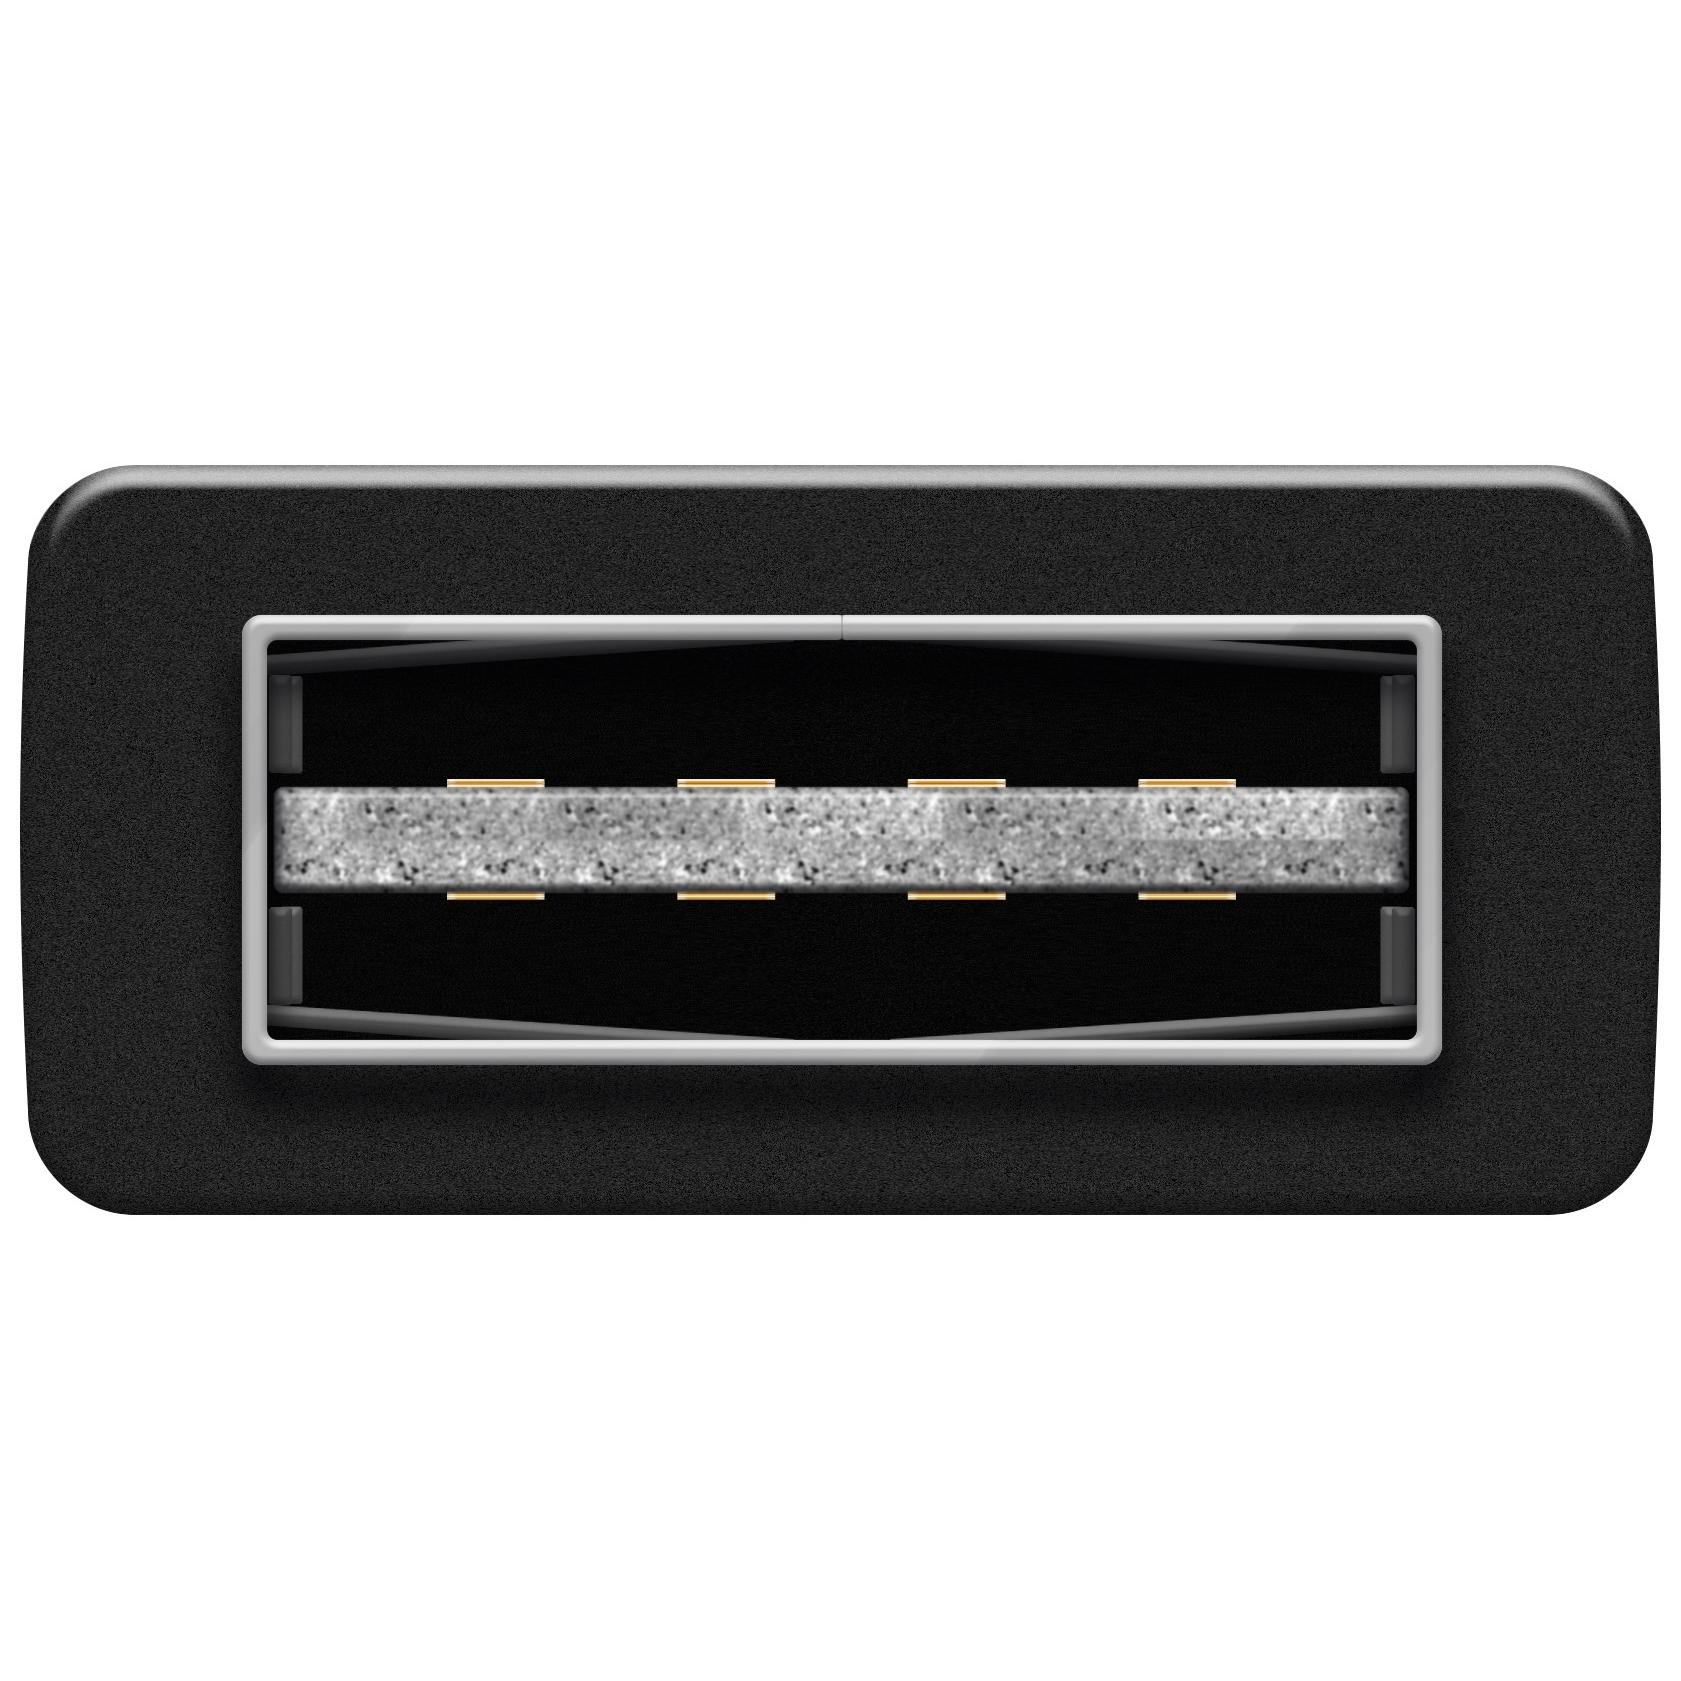 Cavo Easy USB 2.0 A Maschio / Mini B 5 Poli Maschio 2 m